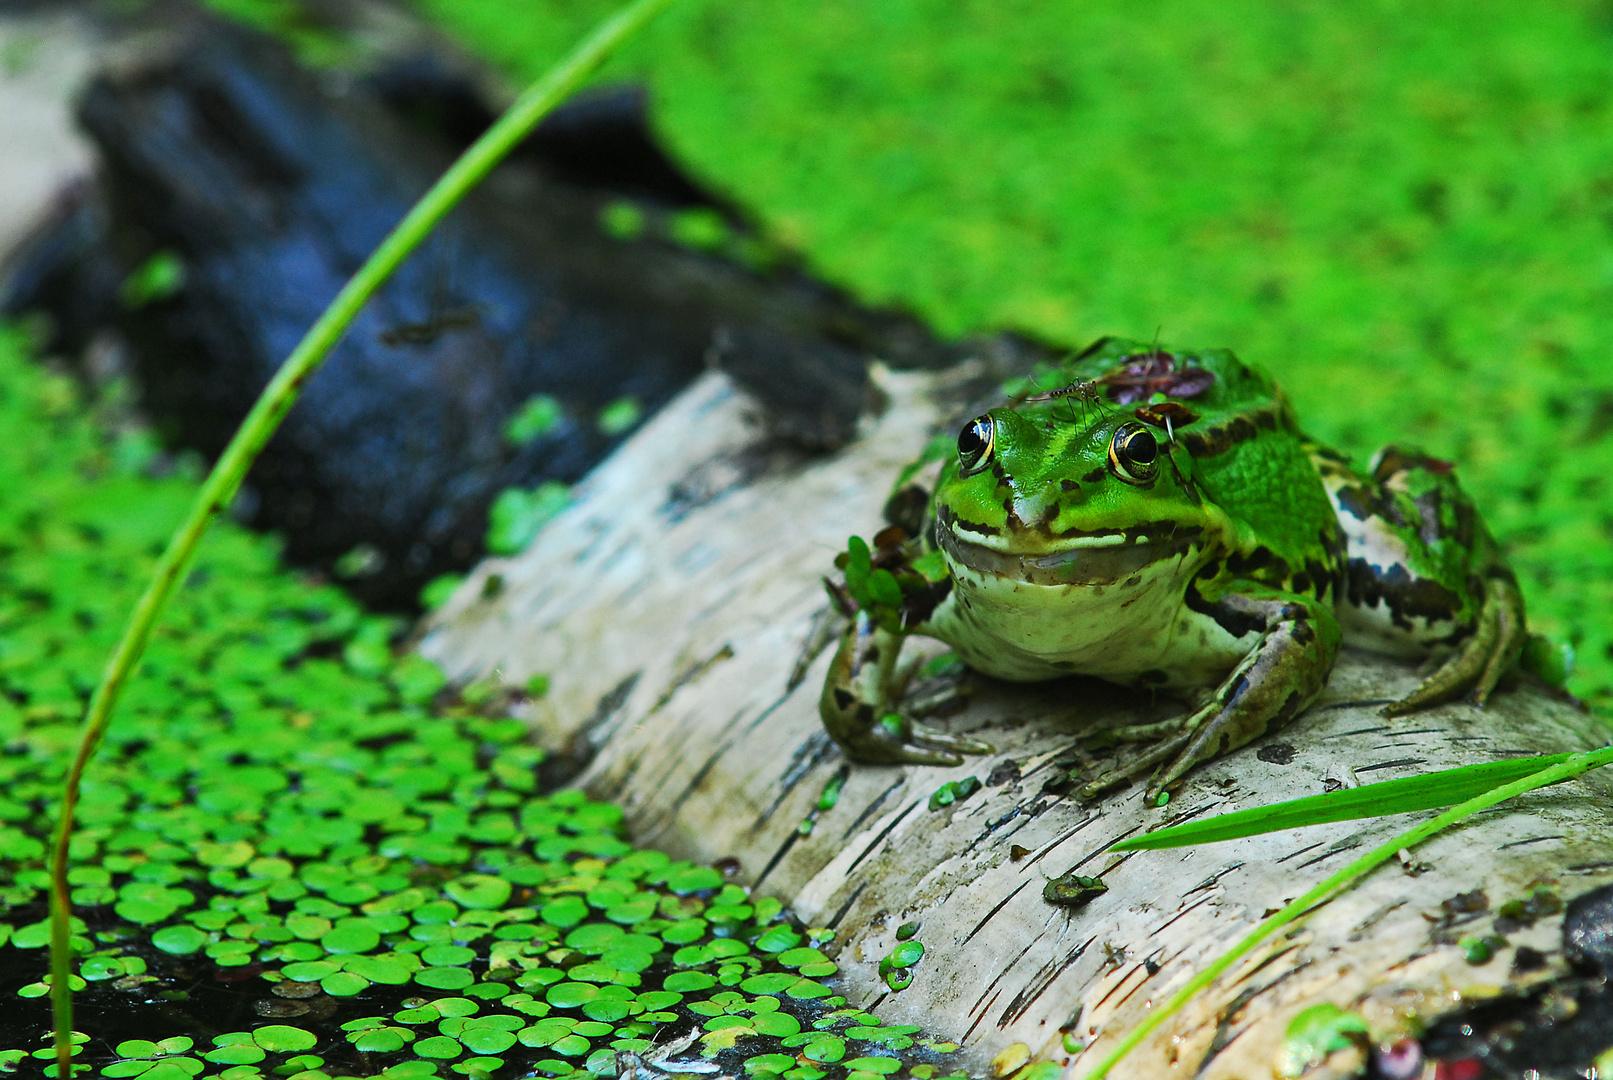 Teich Frosch